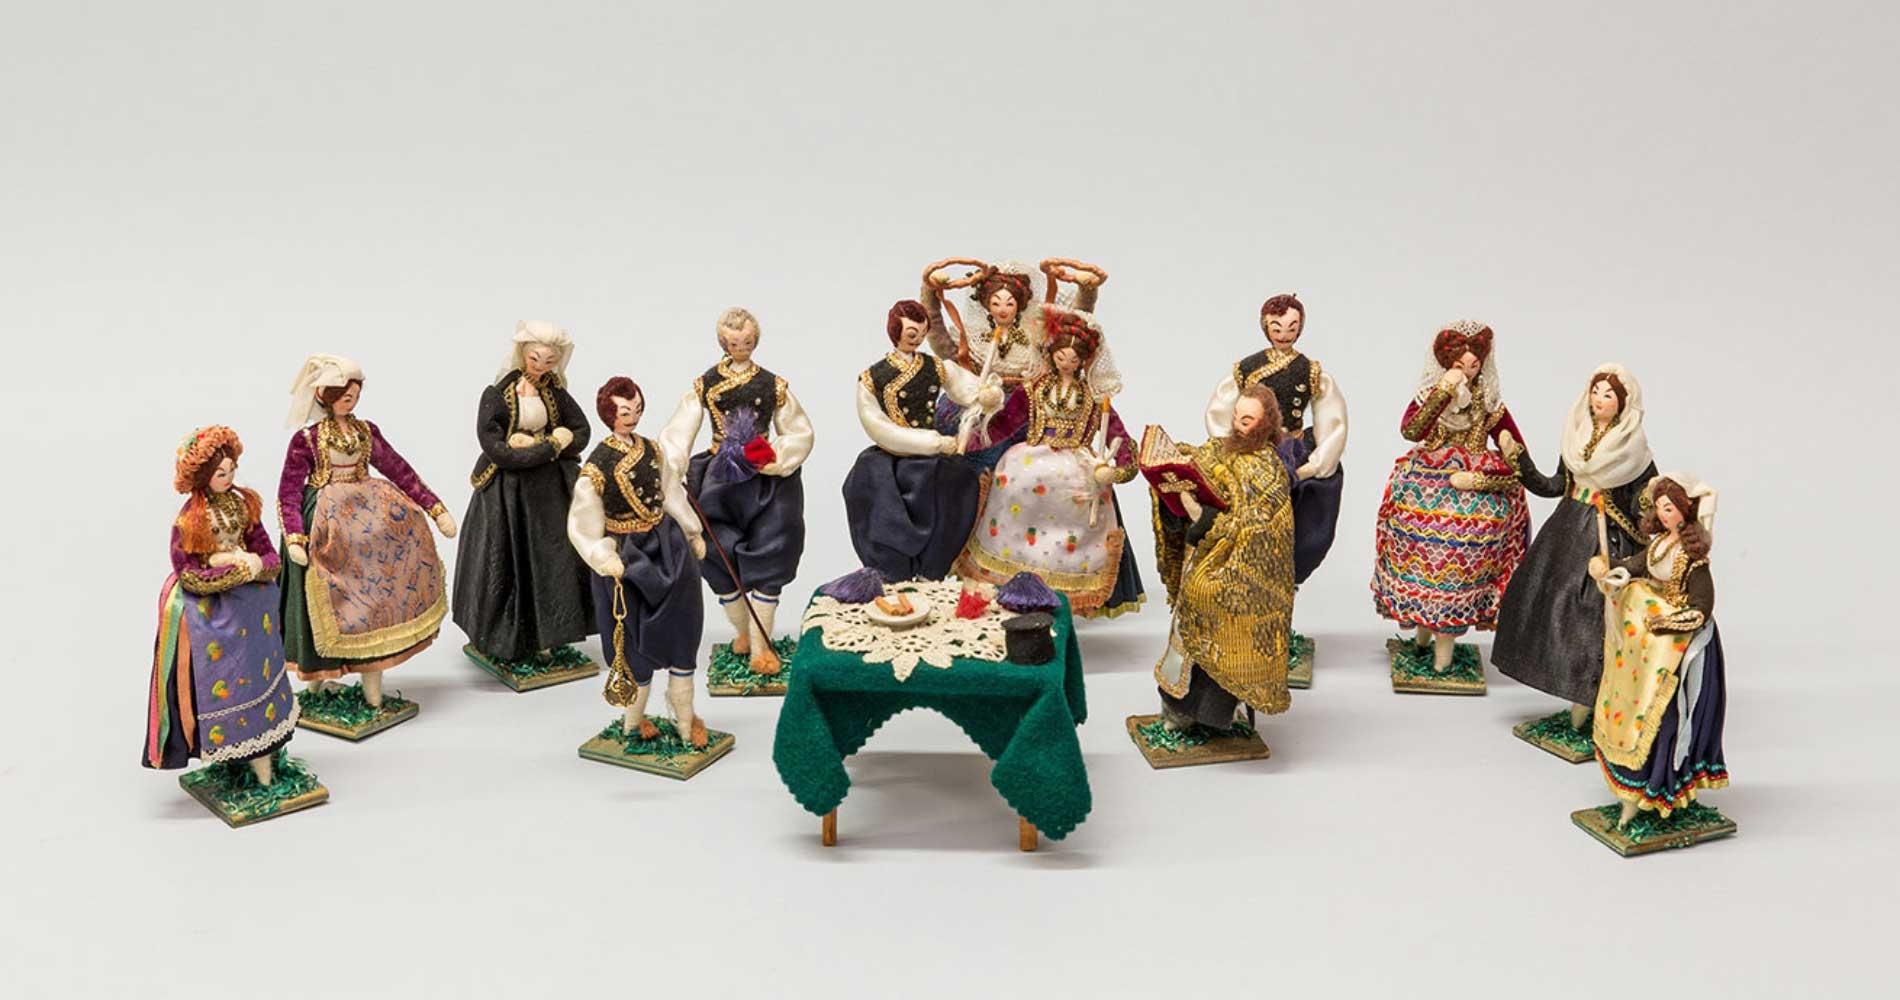 Image result for Μουσείο Παιχνιδιών Μπενάκη στο Παλαιό Φάληρο